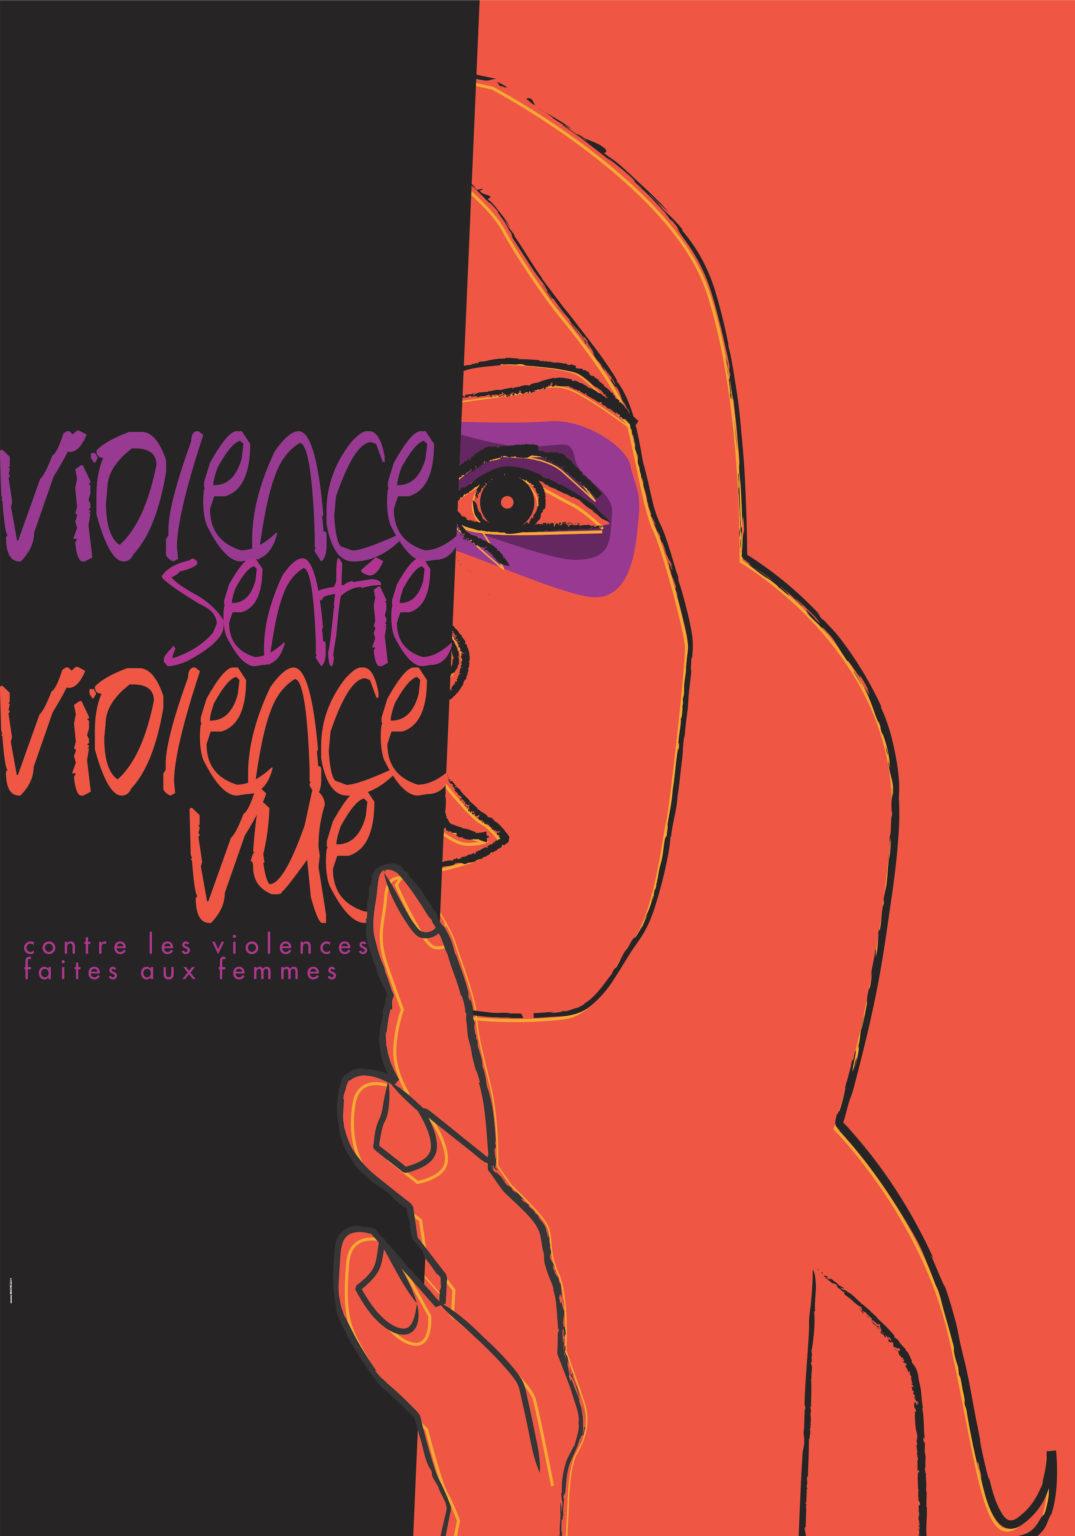 VIOLENCE AGANIST WOMEN